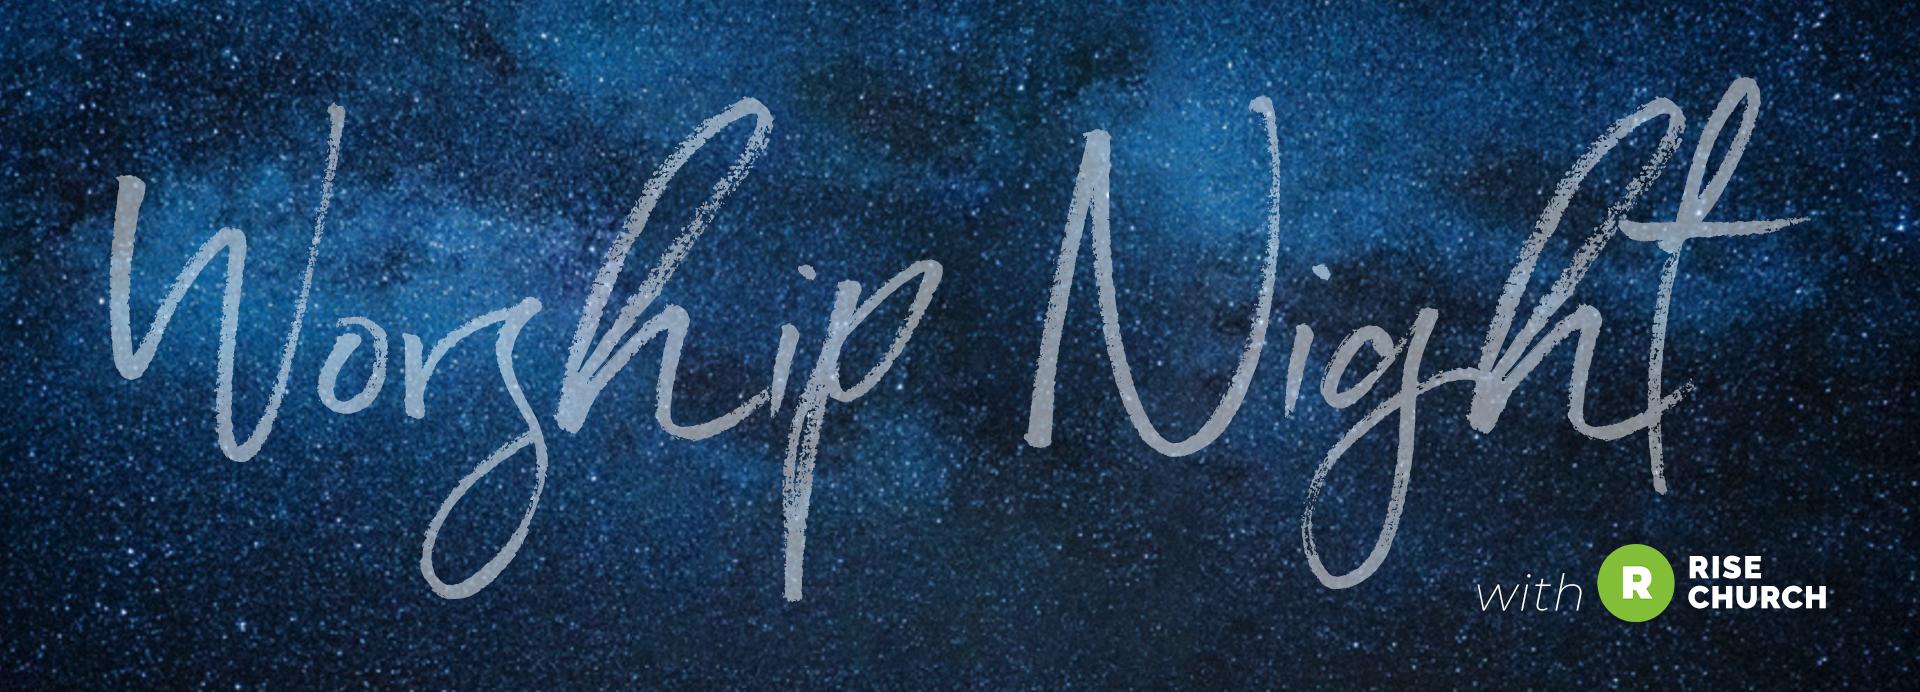 Worship Night_banner.jpg